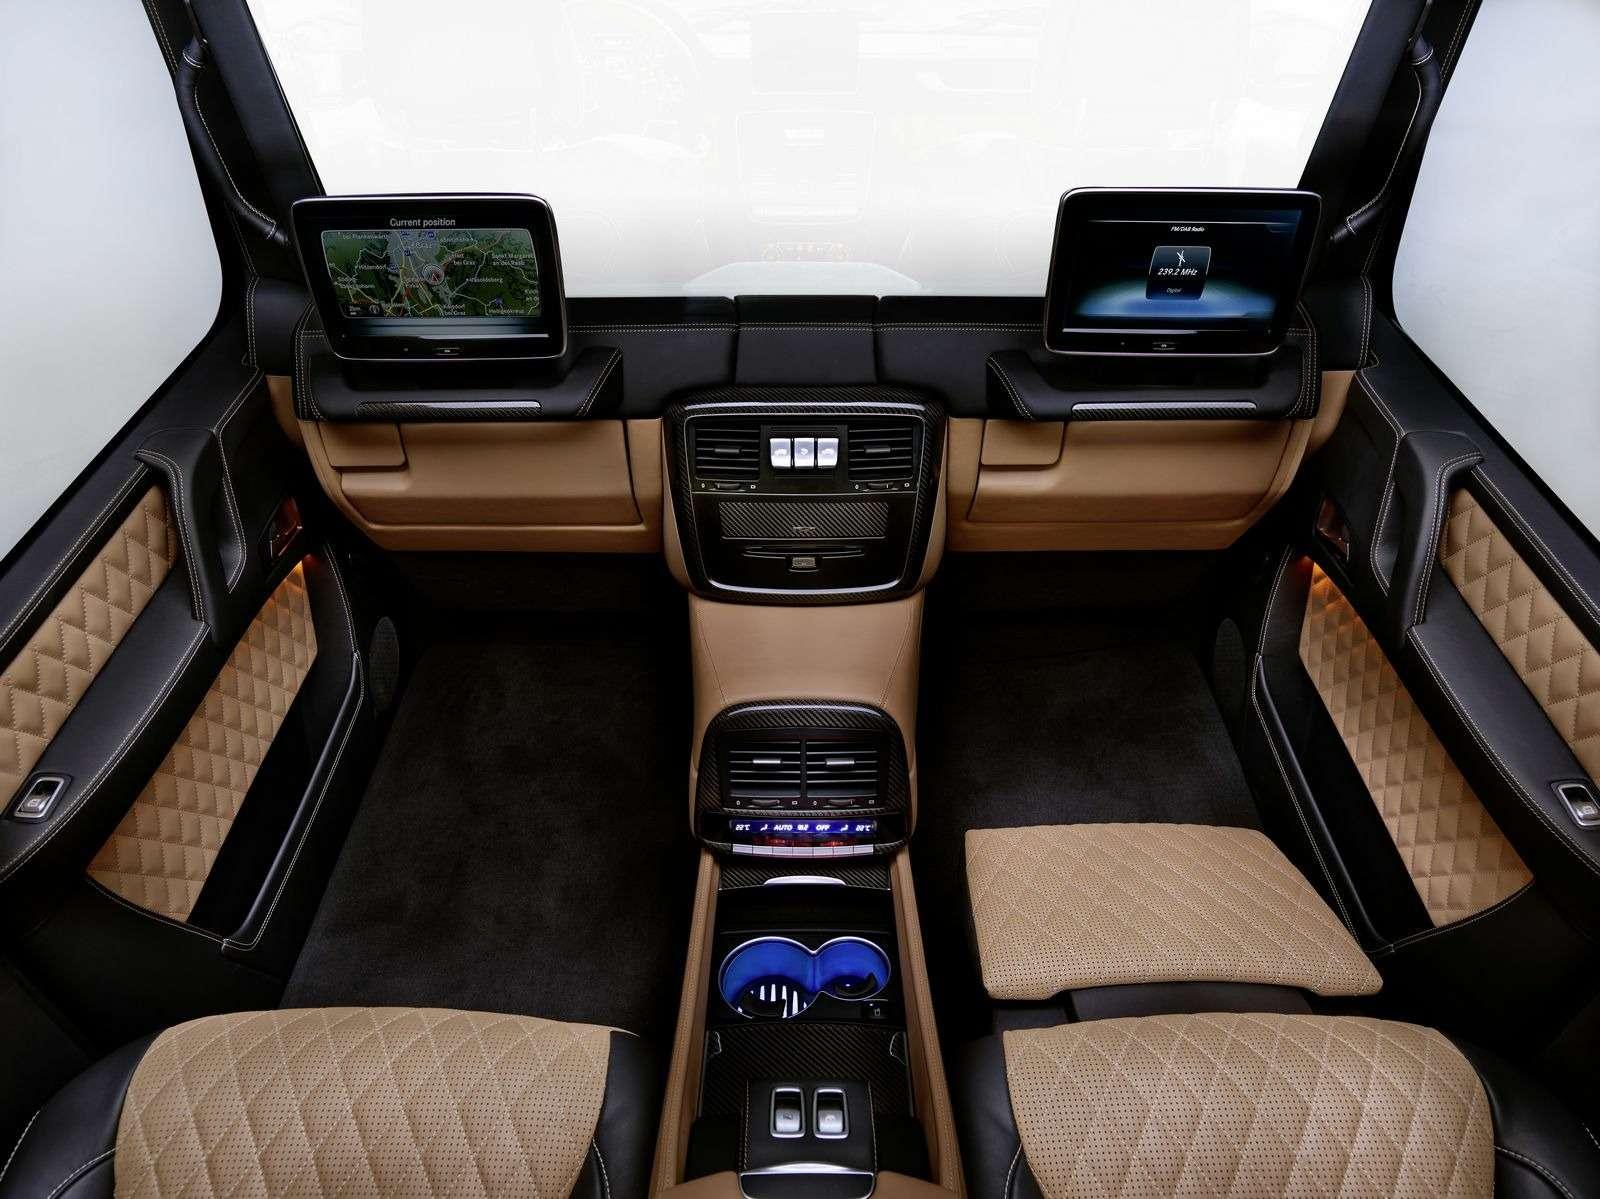 Mercedes-Maybach представил люксовый кабриолет G-класса— фото 706745